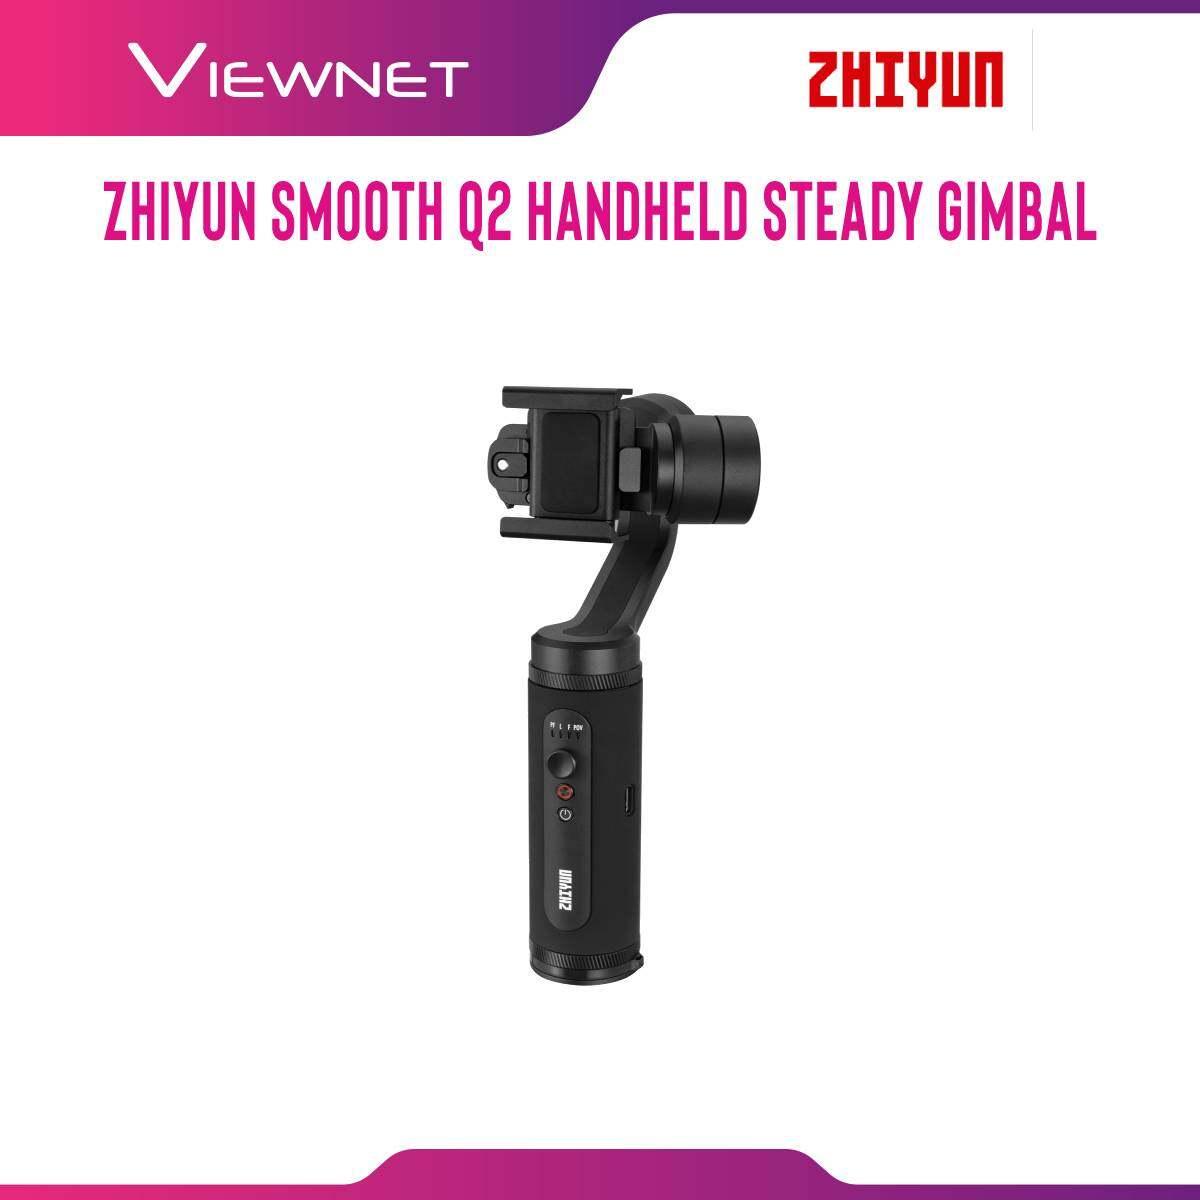 ZHIYUN SMOOTH Q2 HANDHELD STEADY GIMBAL